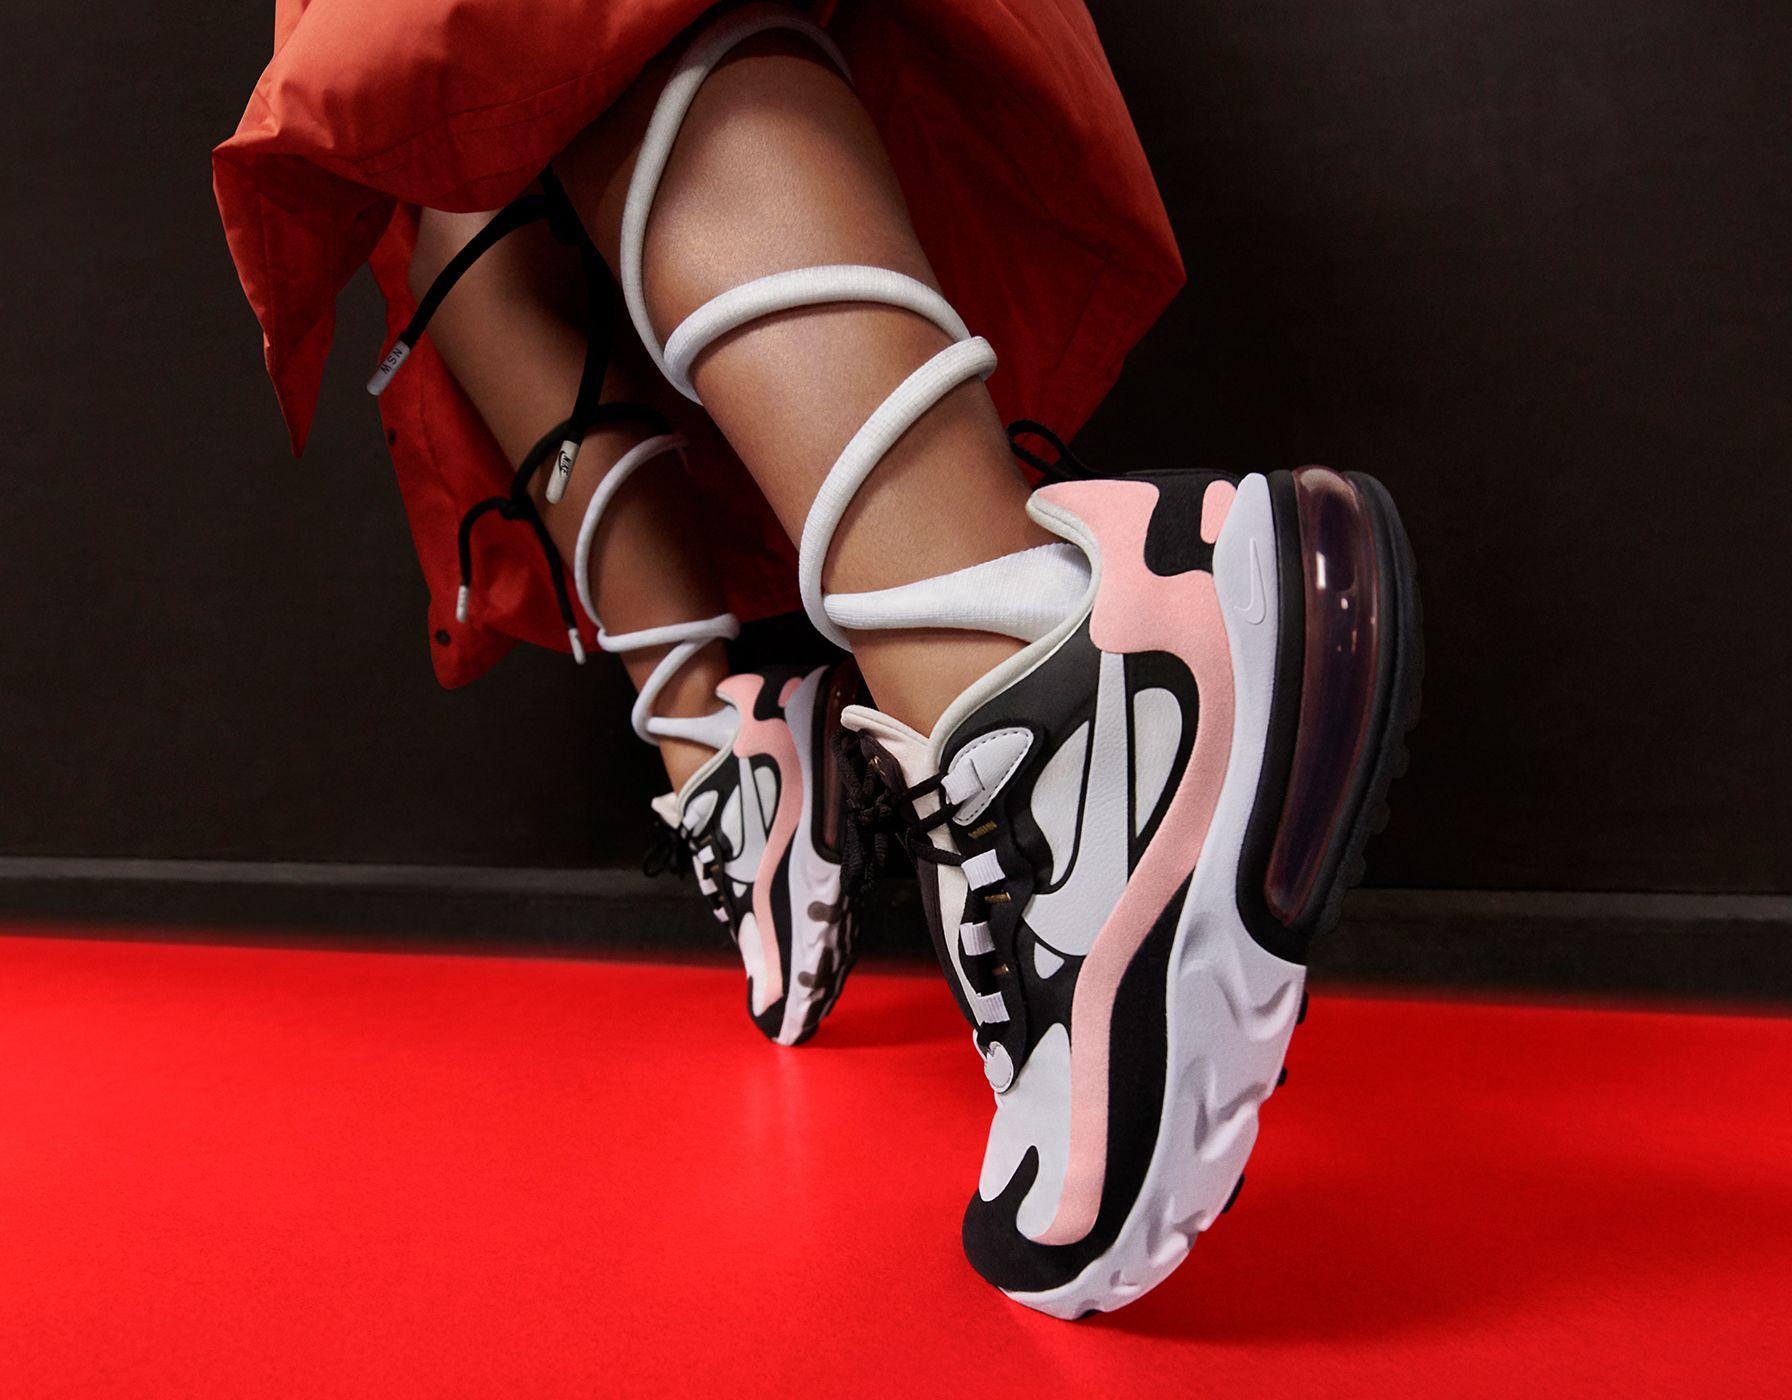 W Nike Air Max 97 LX Bio Beige Size UK 4.5 EUR 38 US 7